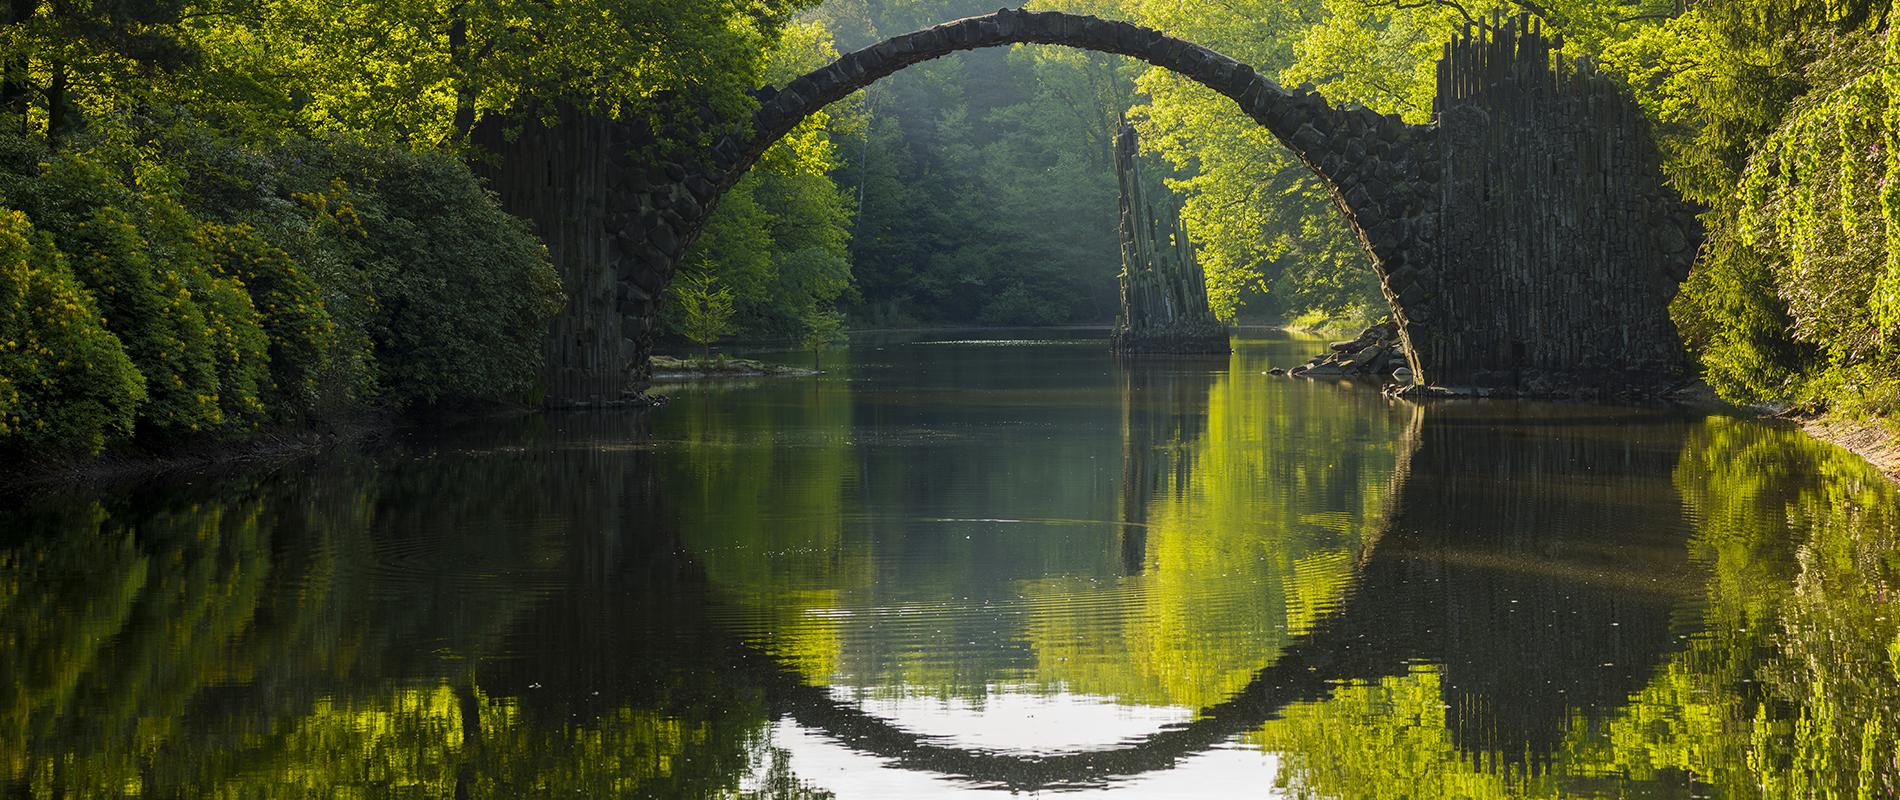 Rakotz Bridge, il Ponte del Diavolo in Sassonia